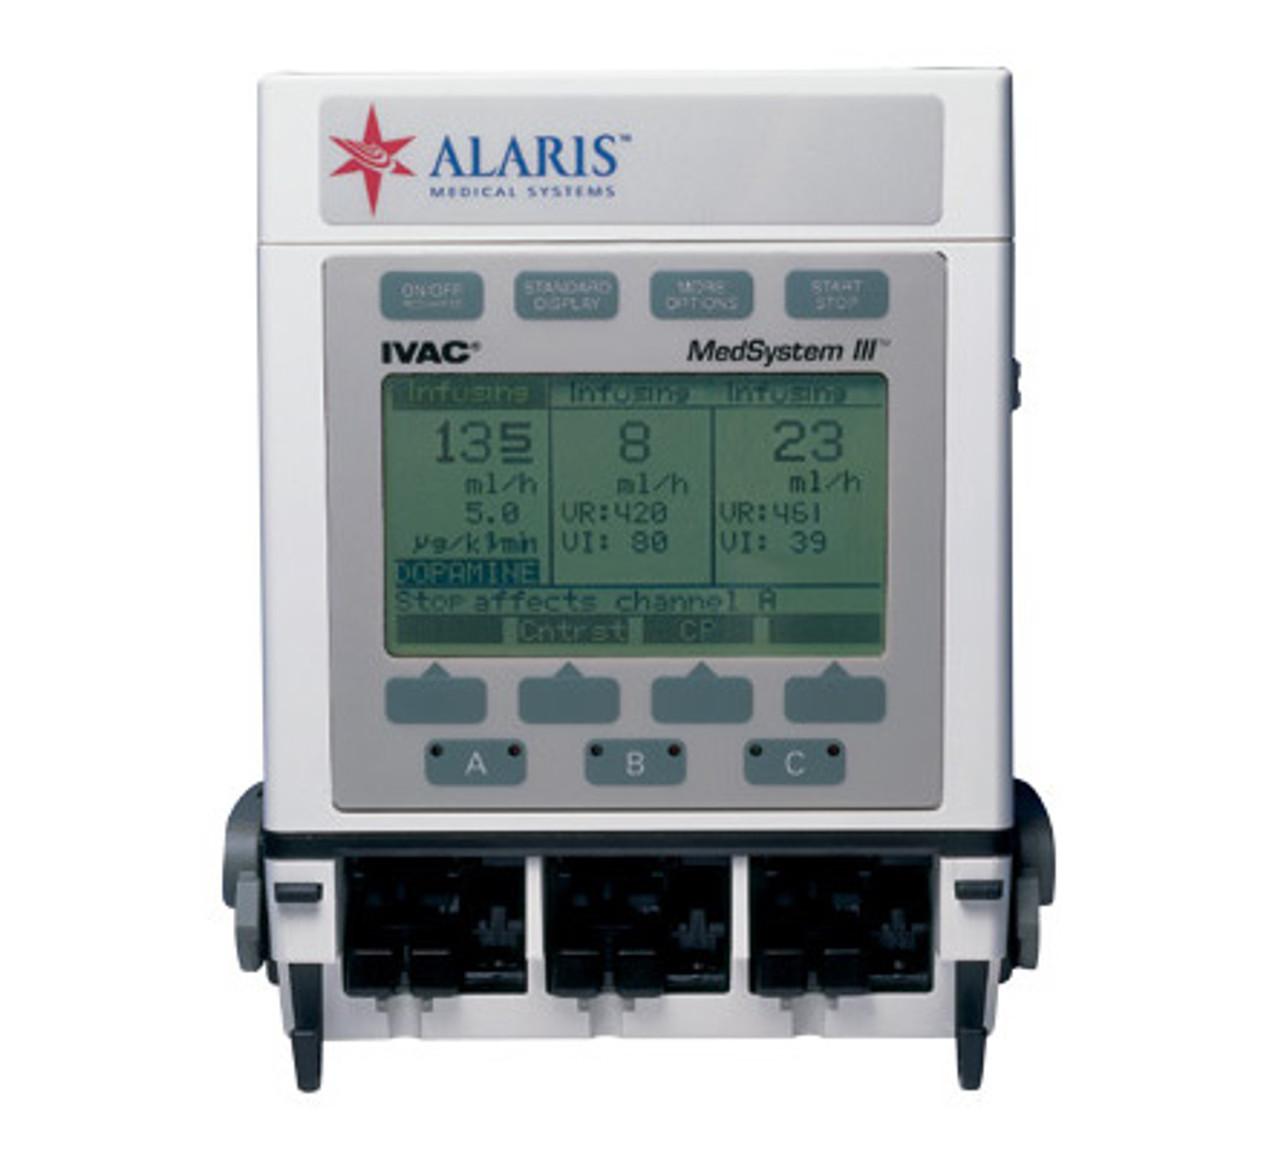 Carefusion (Alaris) Medsystem III Infusion Pump